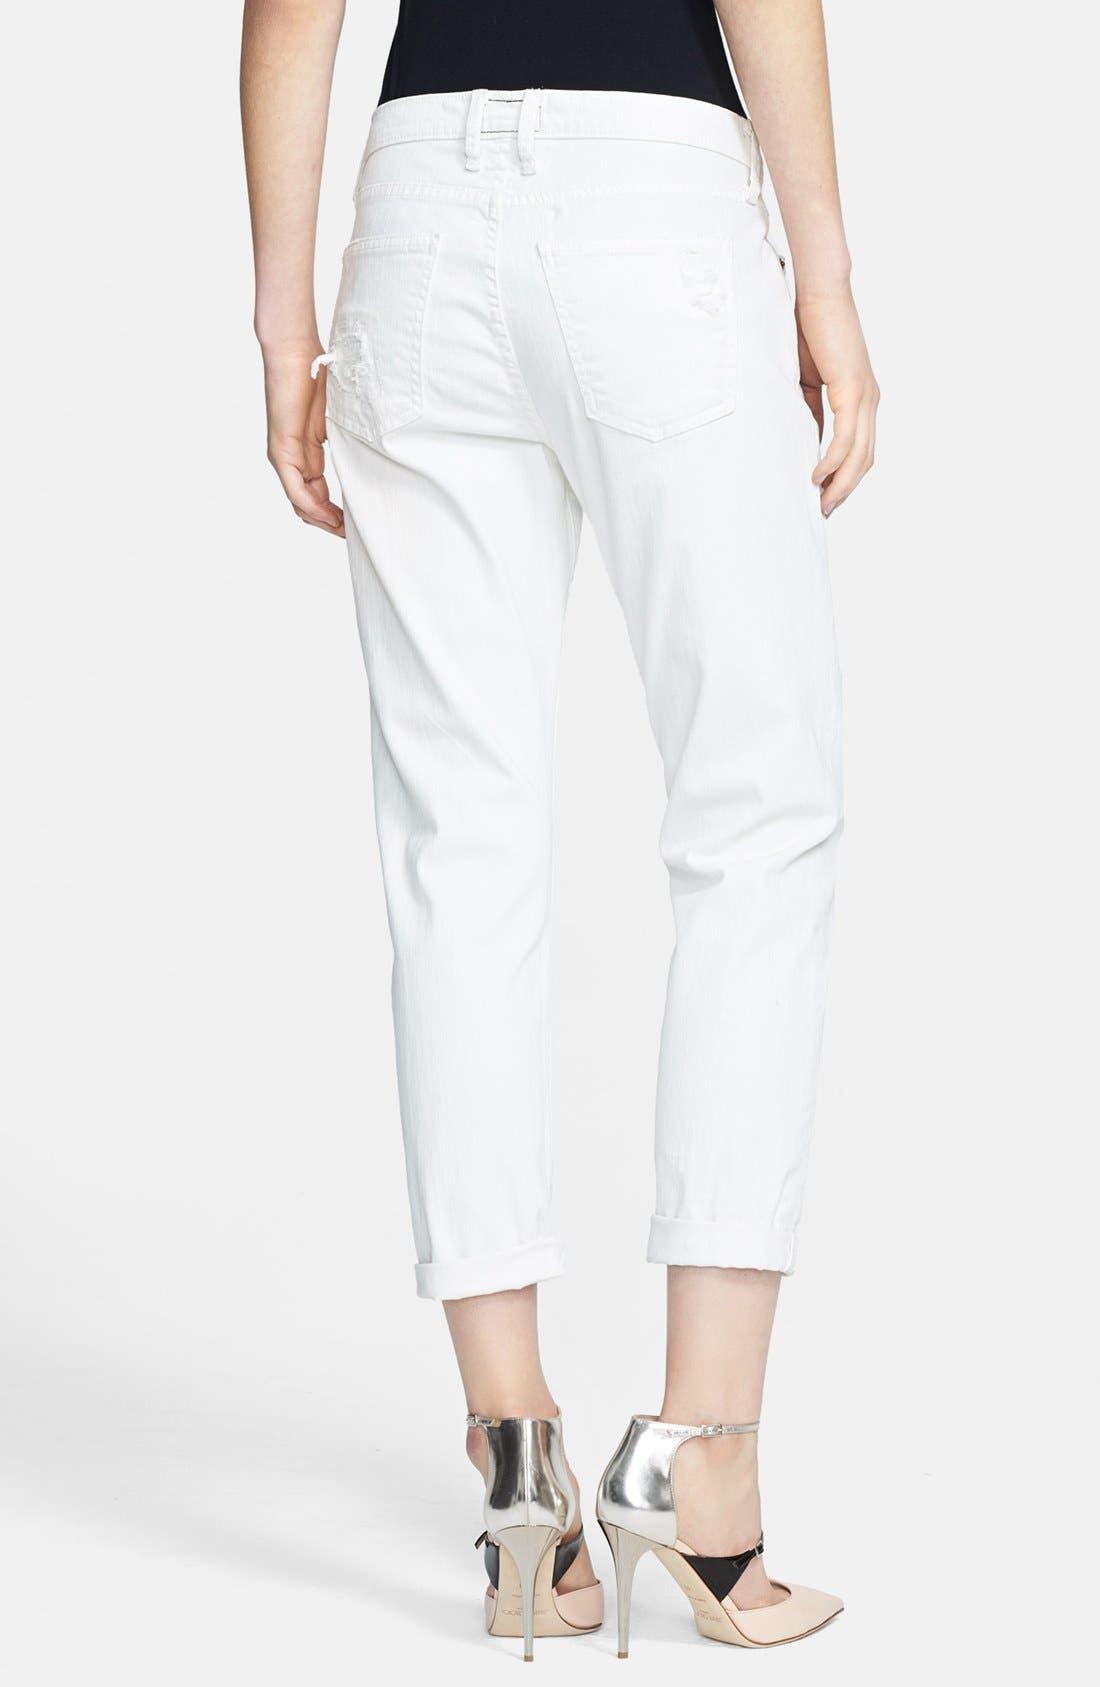 Alternate Image 2  - Current/Elliott 'The Stiletto' Jeans (Dirty White)